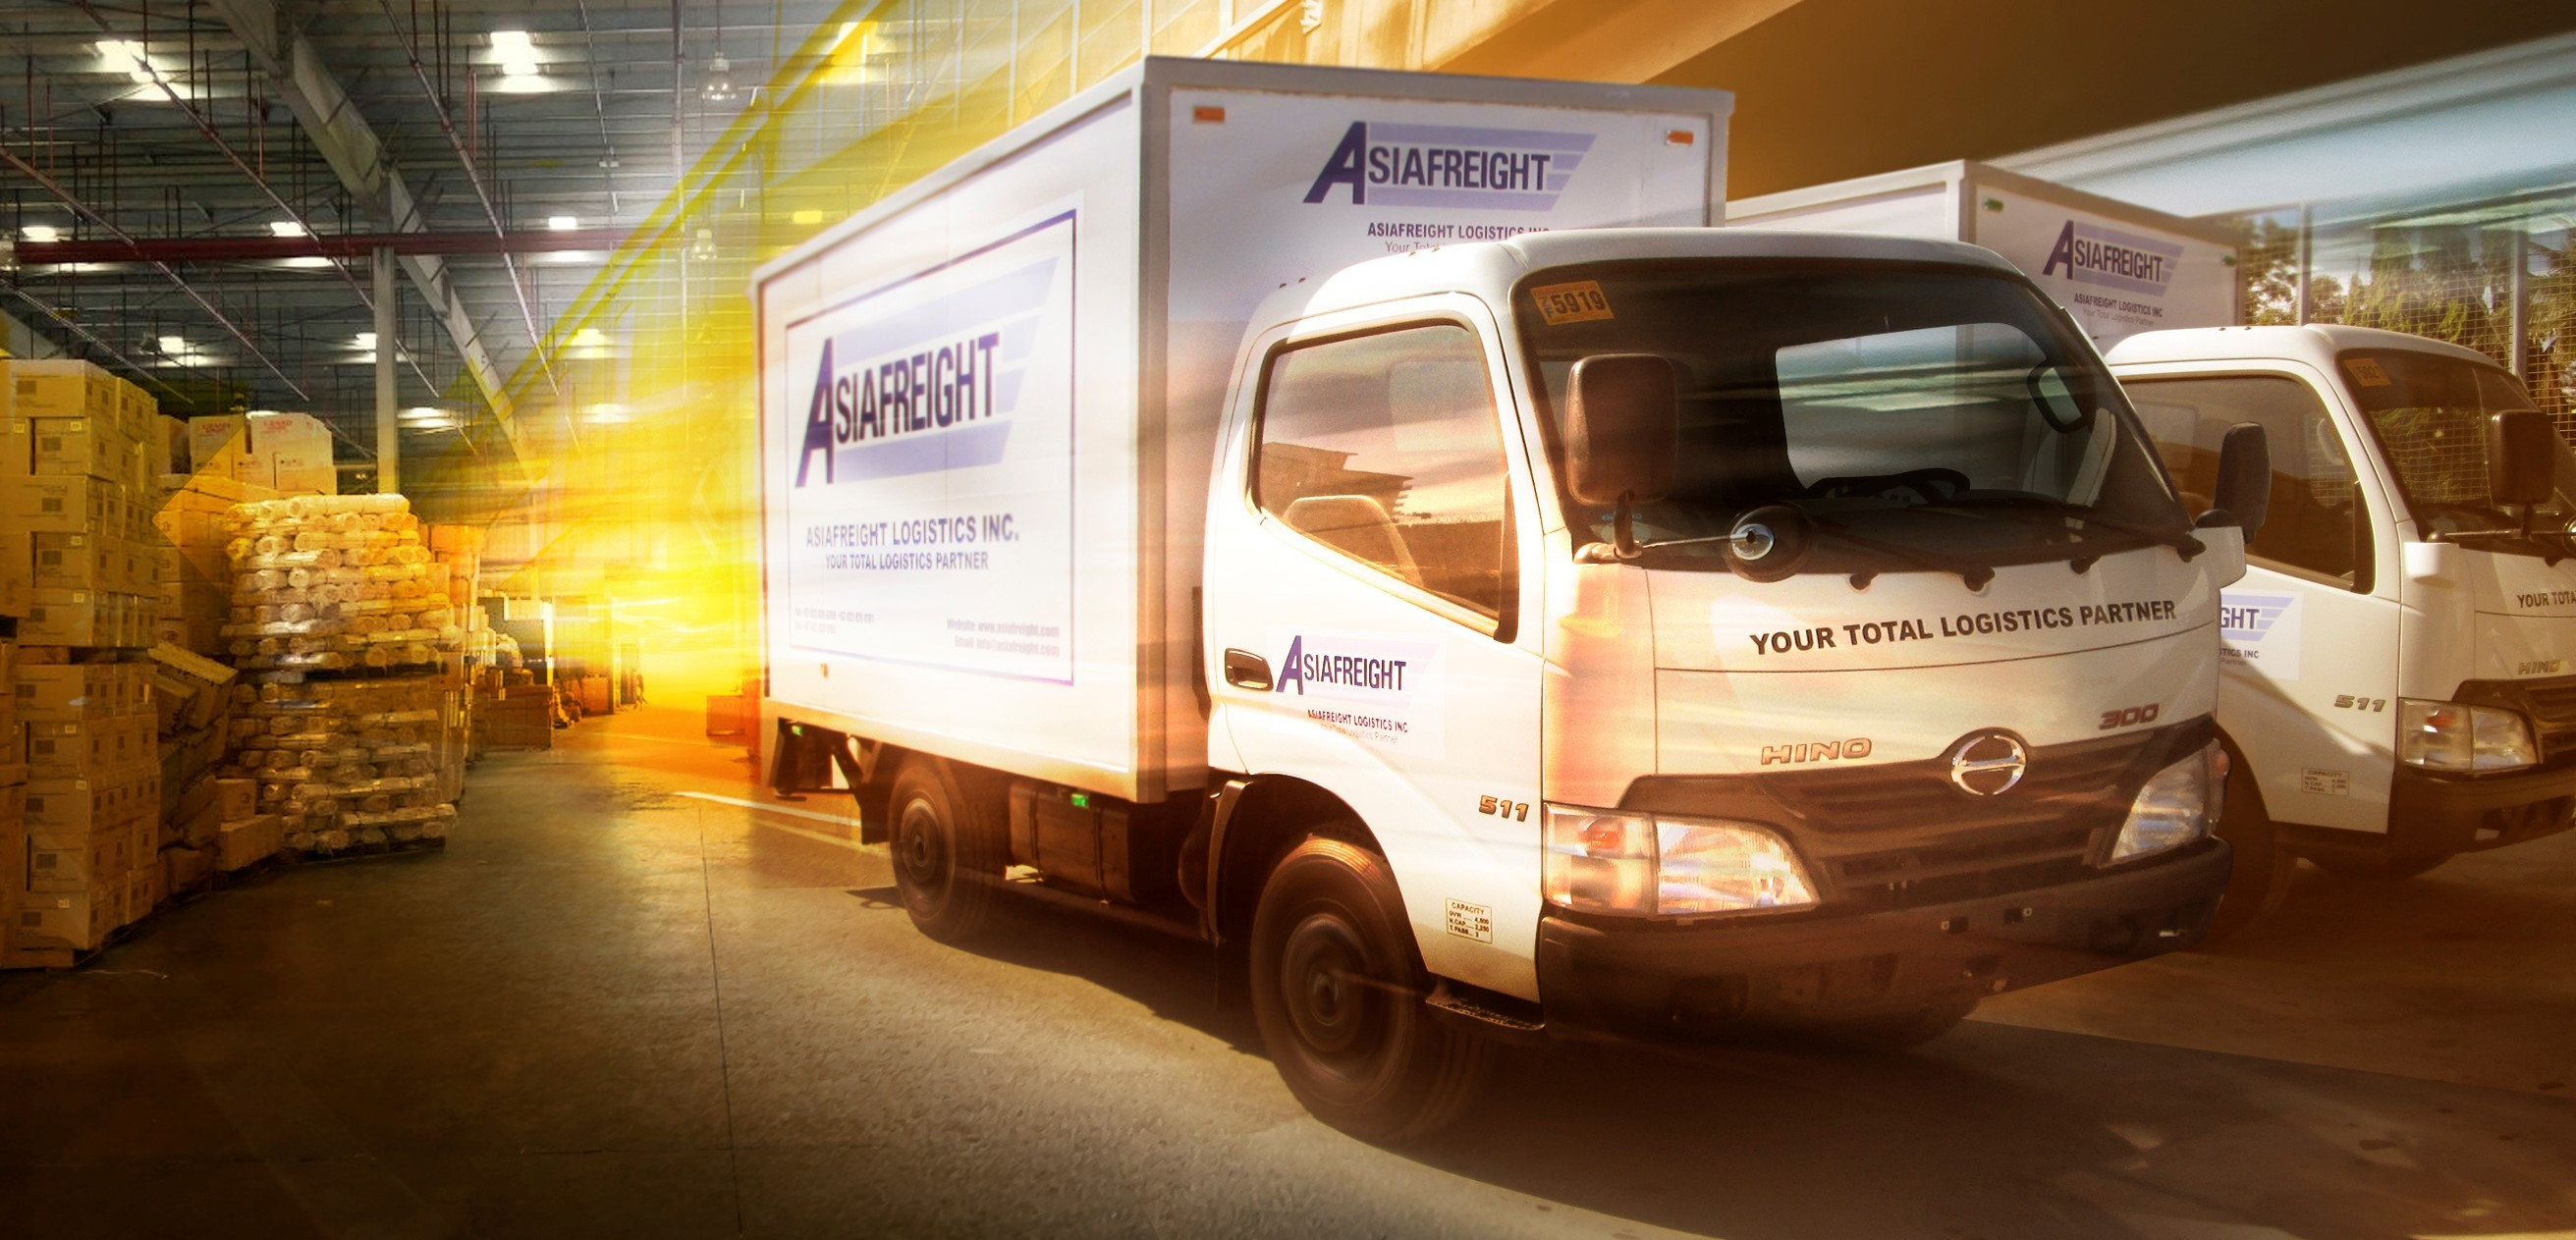 AsiaFreight Logistics Inc | LinkedIn